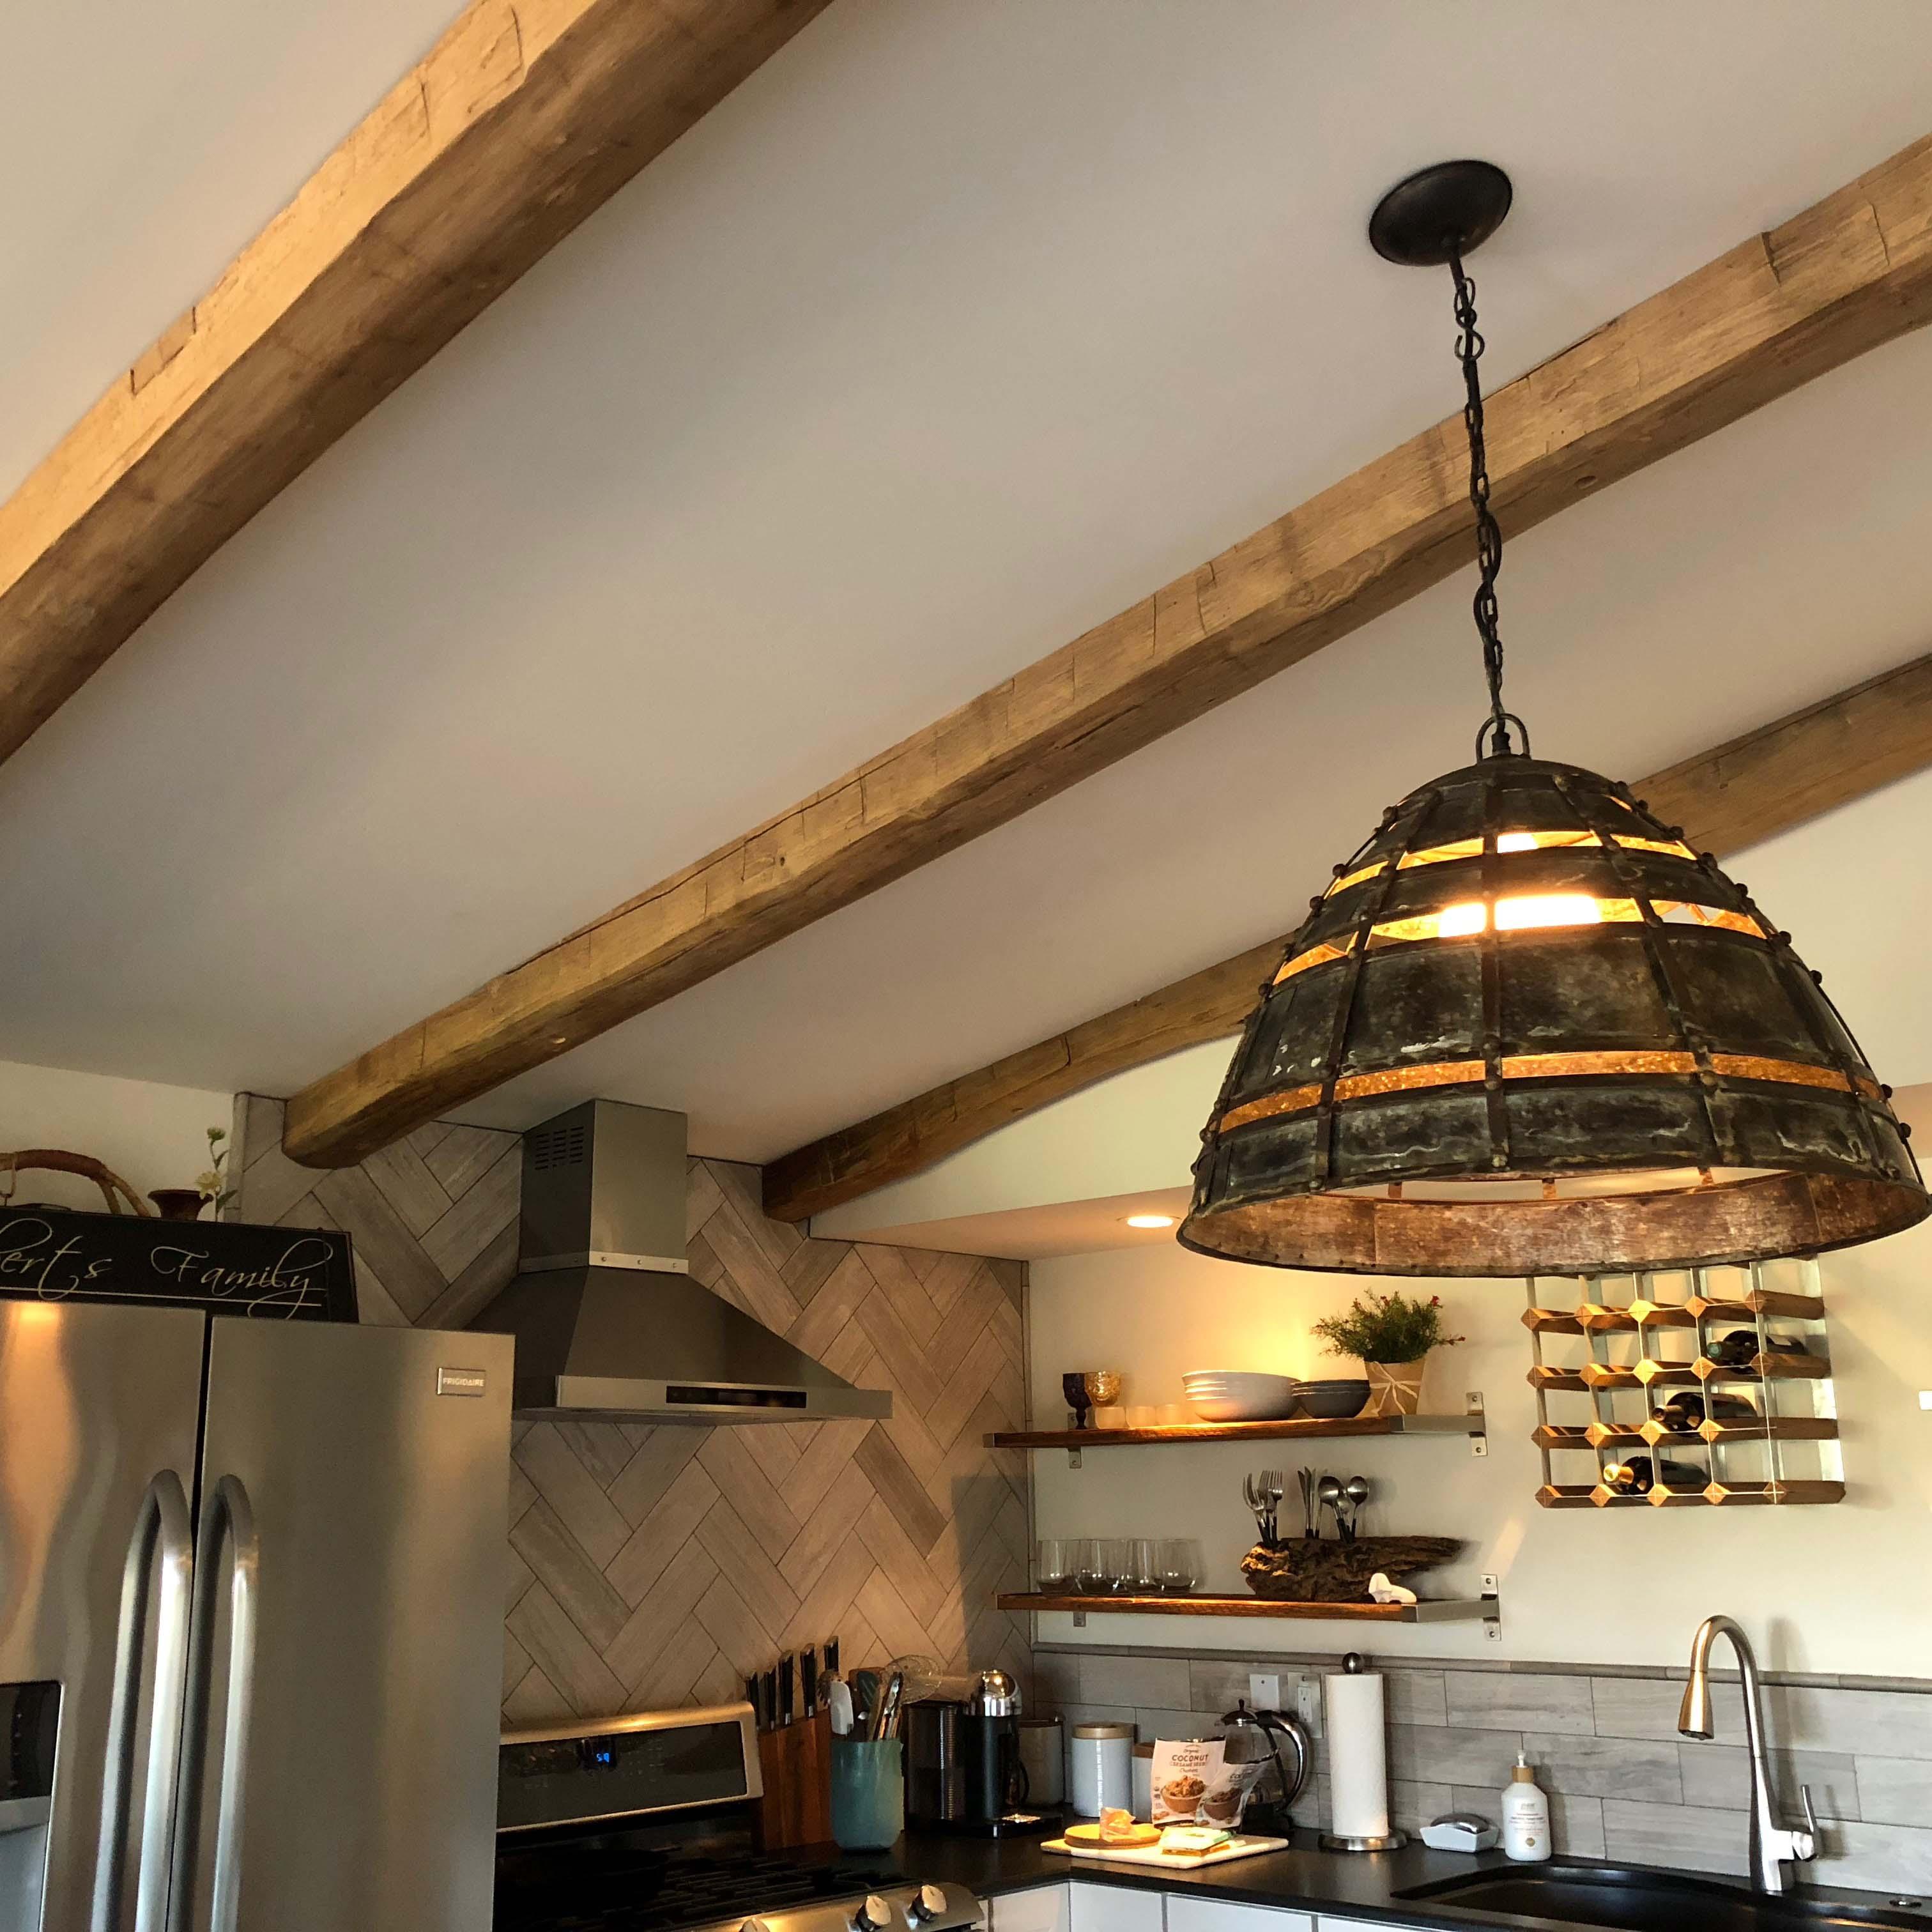 edge hardwood beams08 - Reclaimed Hardwood Barn Timbers